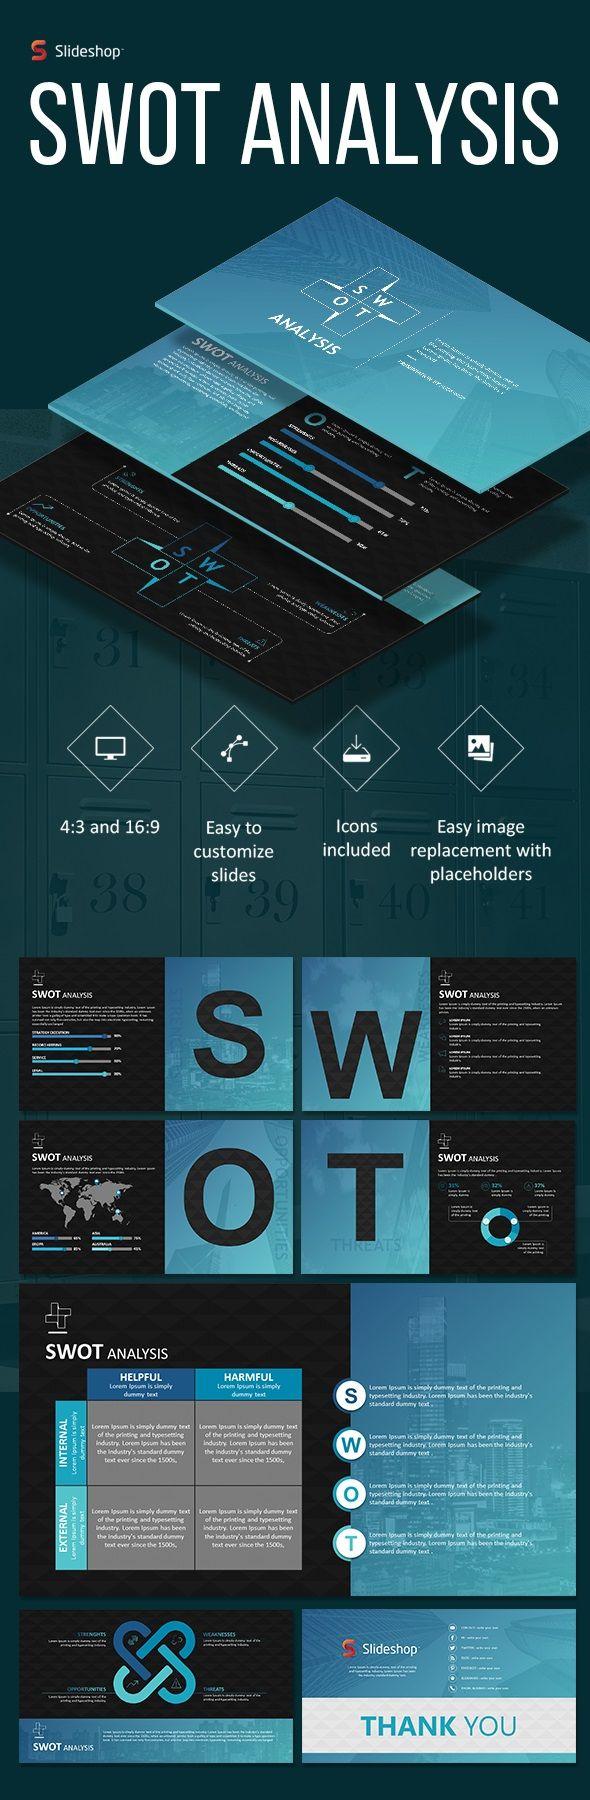 SWOT Analysis A